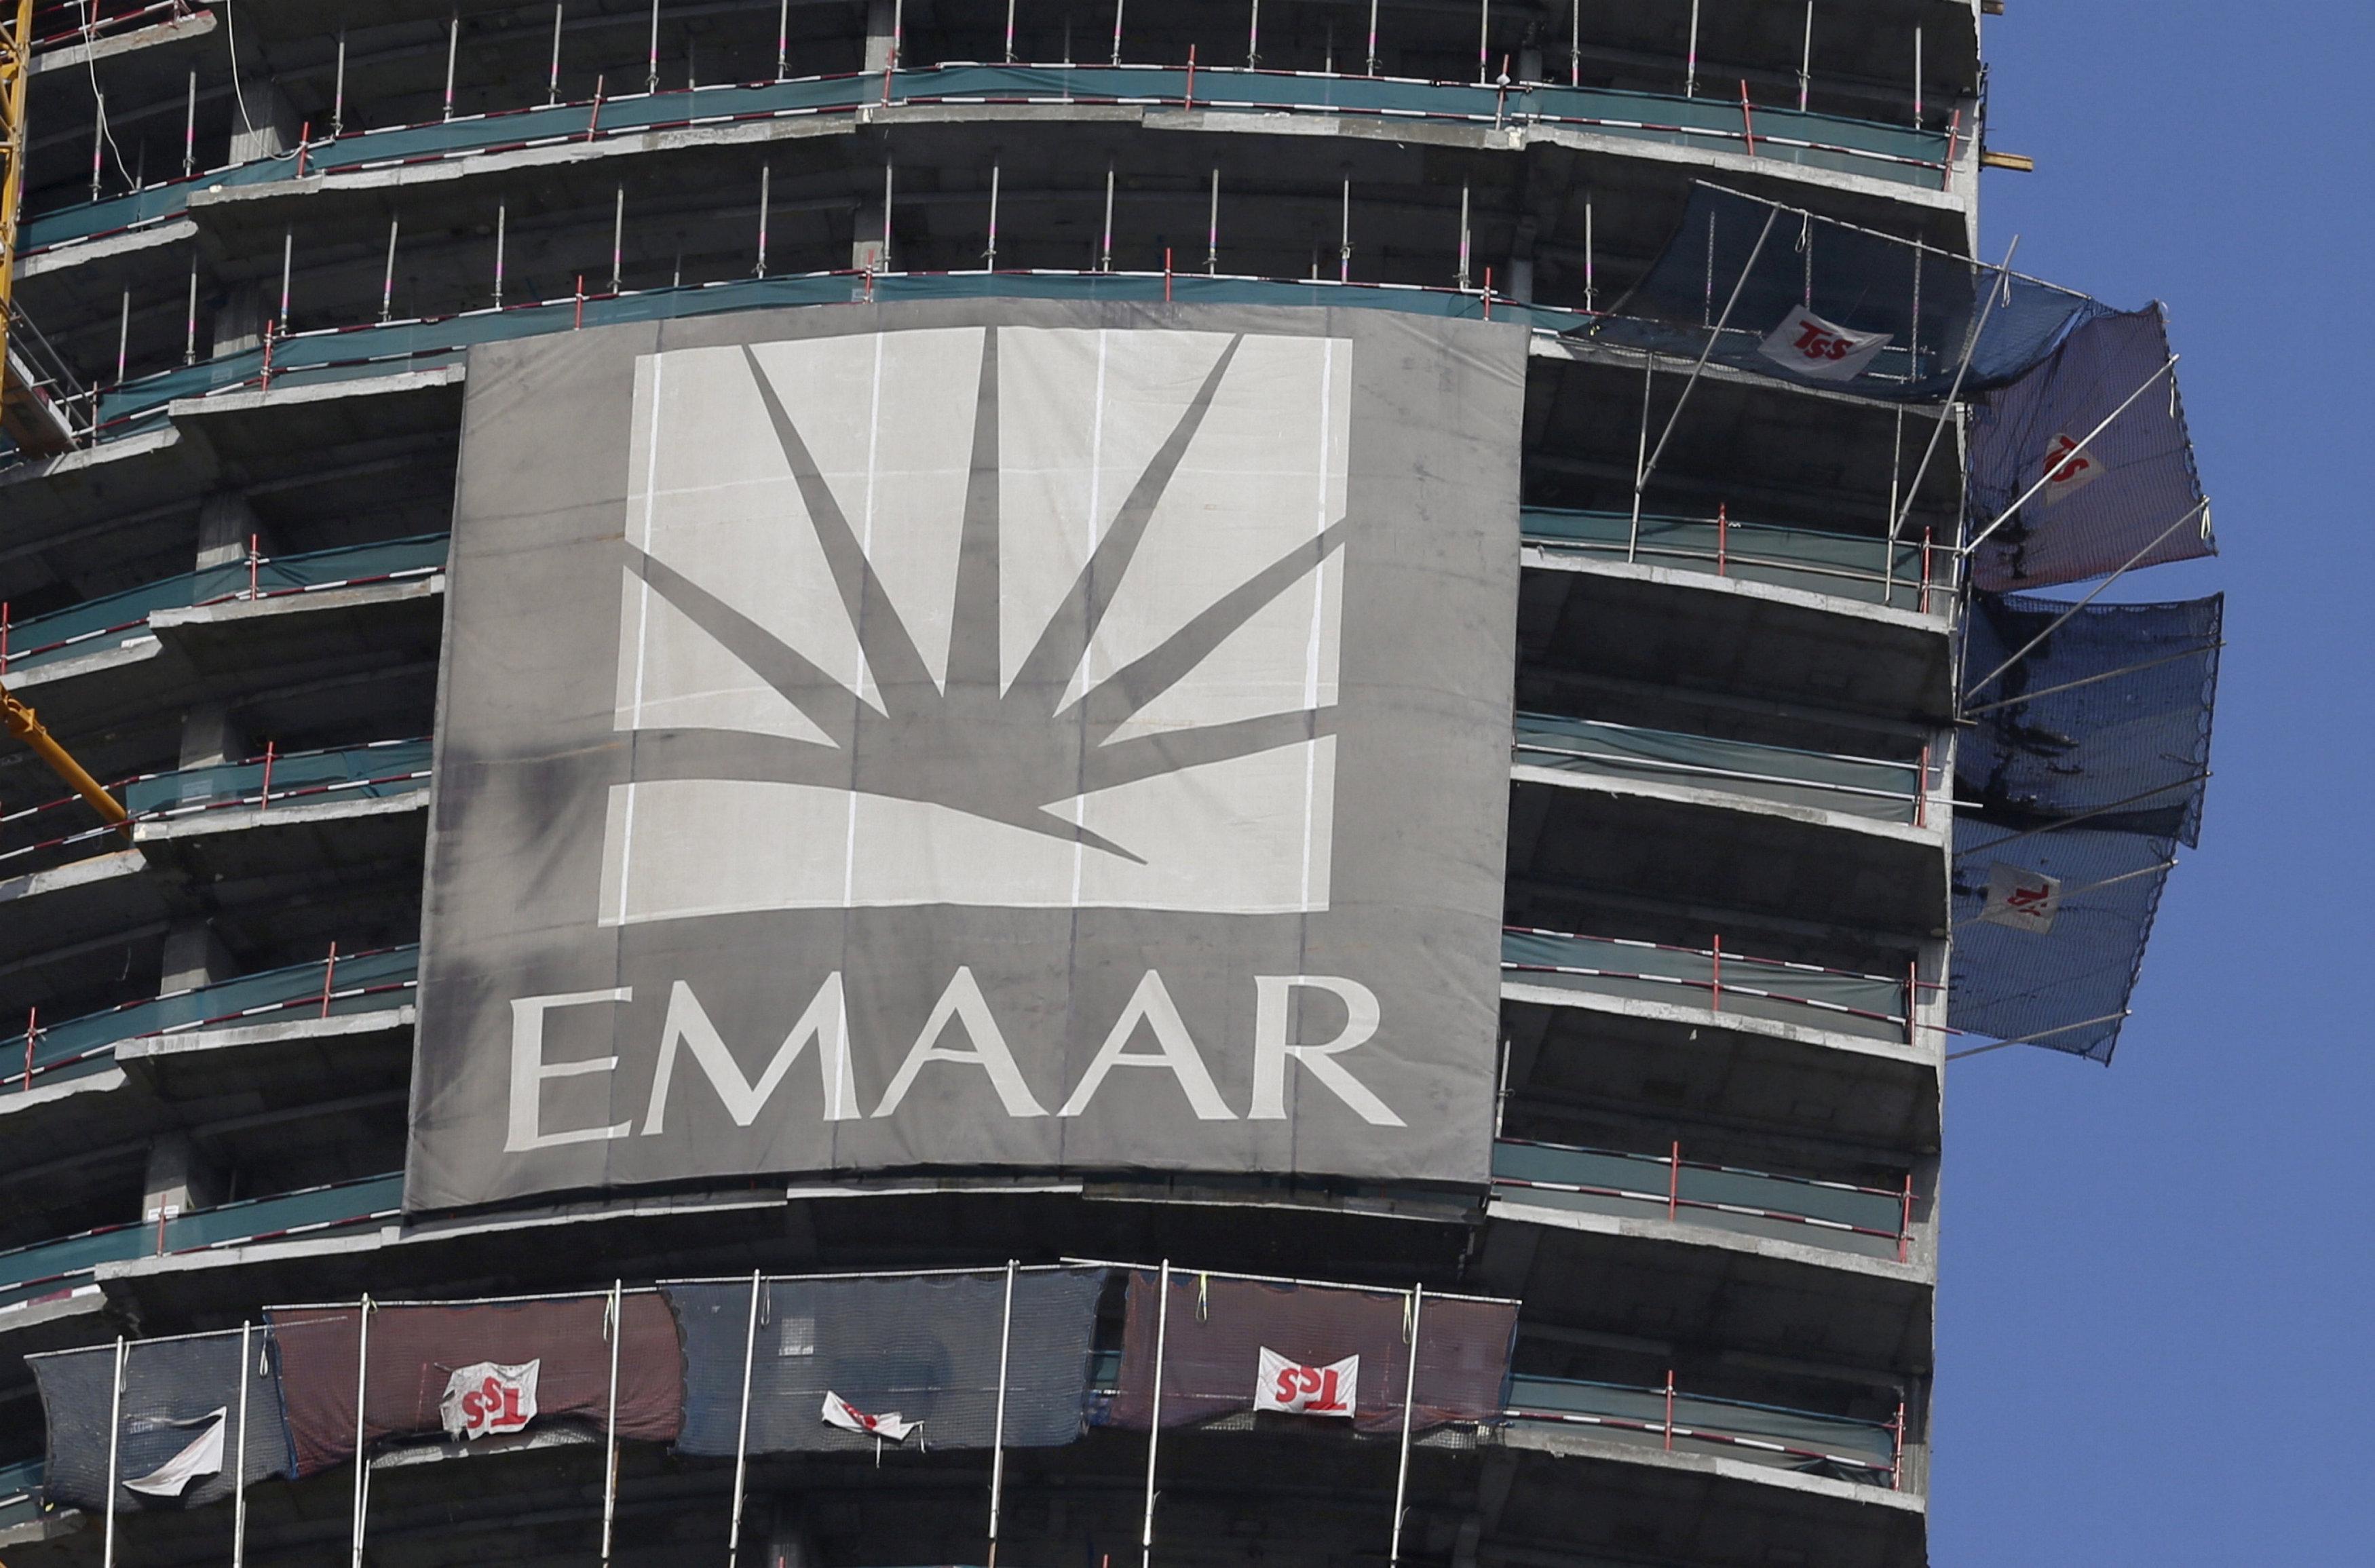 Emaar Malls' $800 million bid for Souq com to challenge